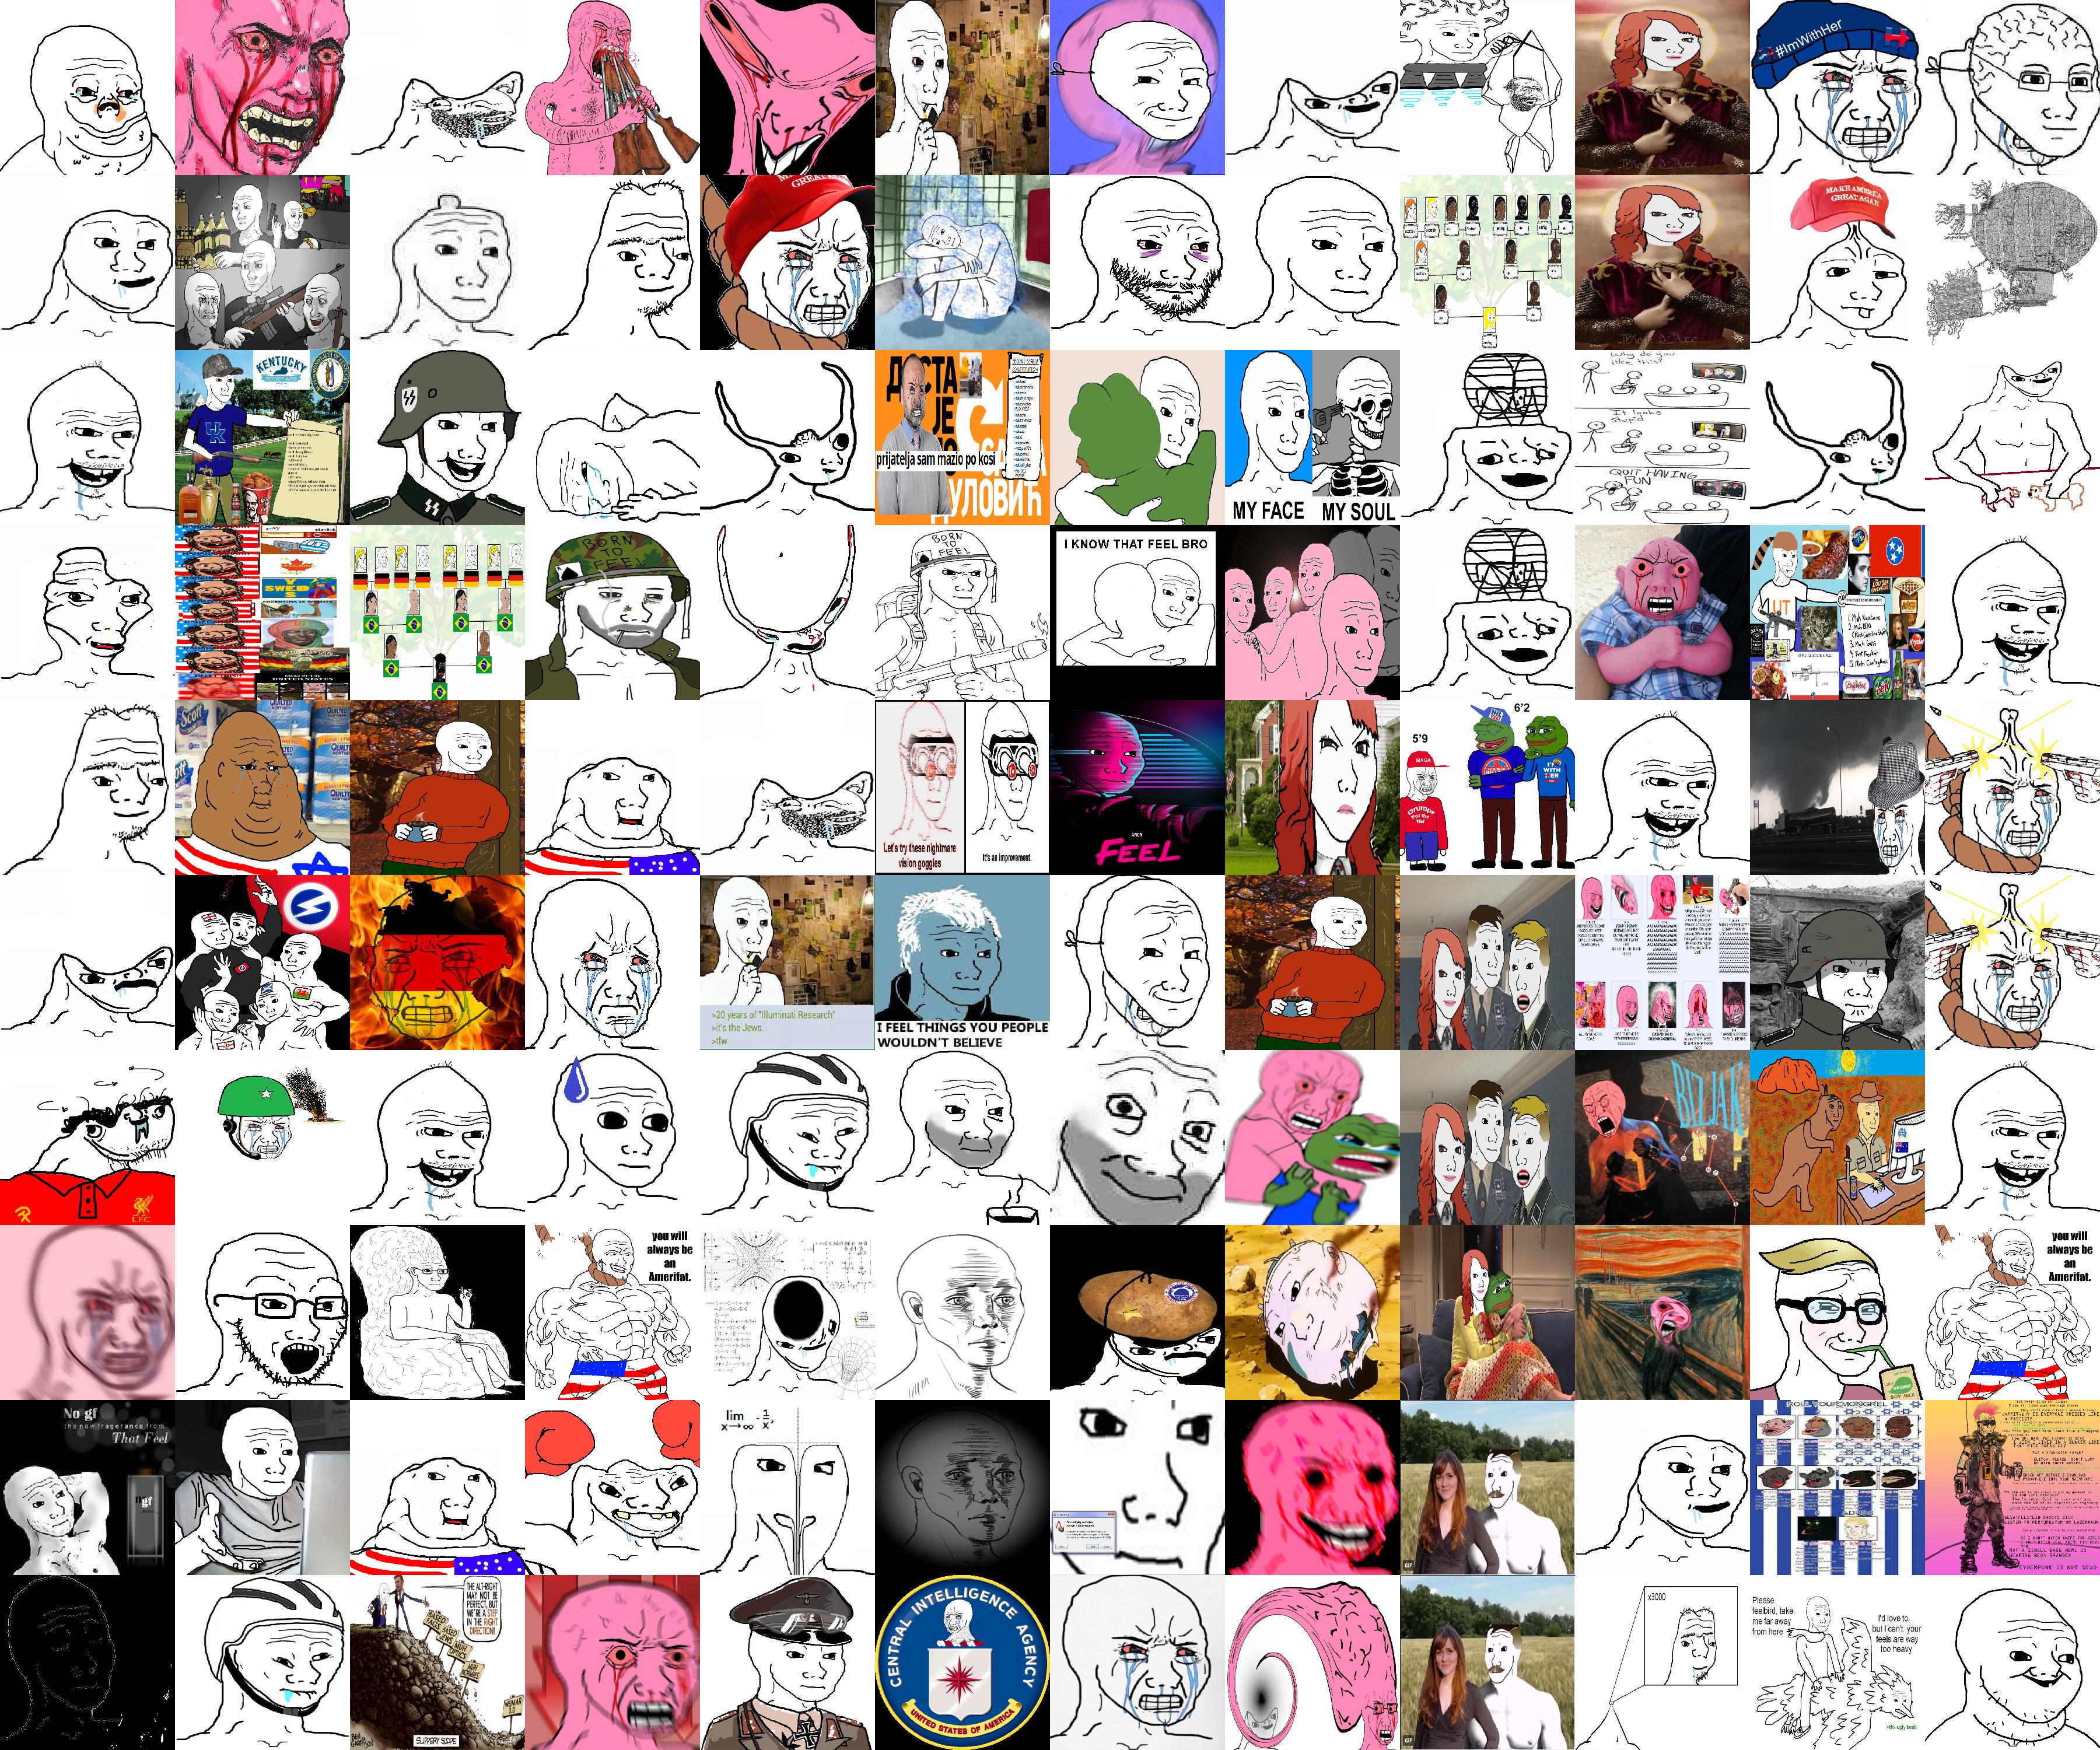 feelsguy 4chan pol image walls memes oilab